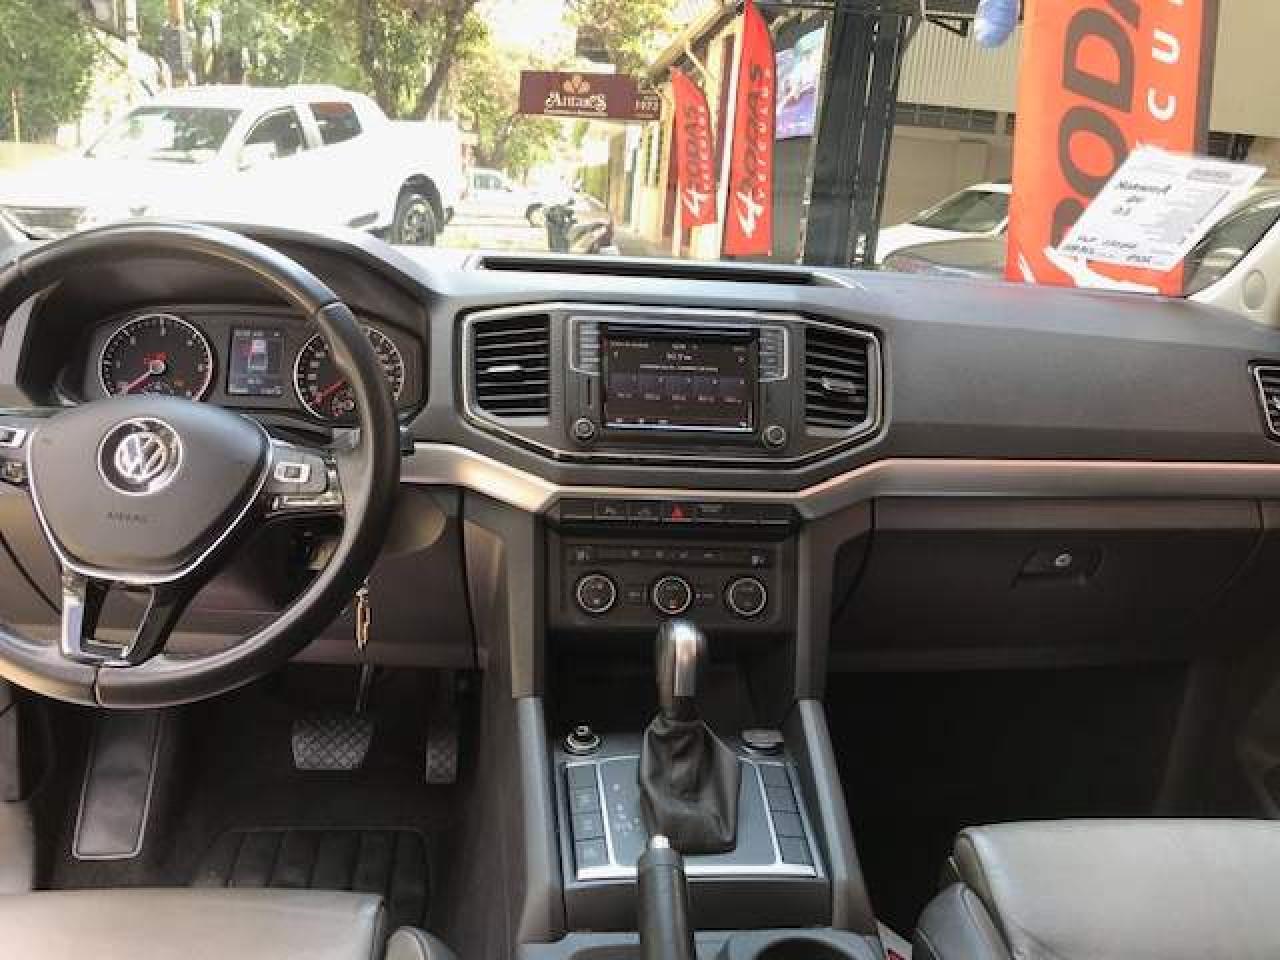 Amarok 3.0 V6 CABINE DUPLA 4X4 HIGHLINE TURBO INTERCOOLER AUTOMÁTICO